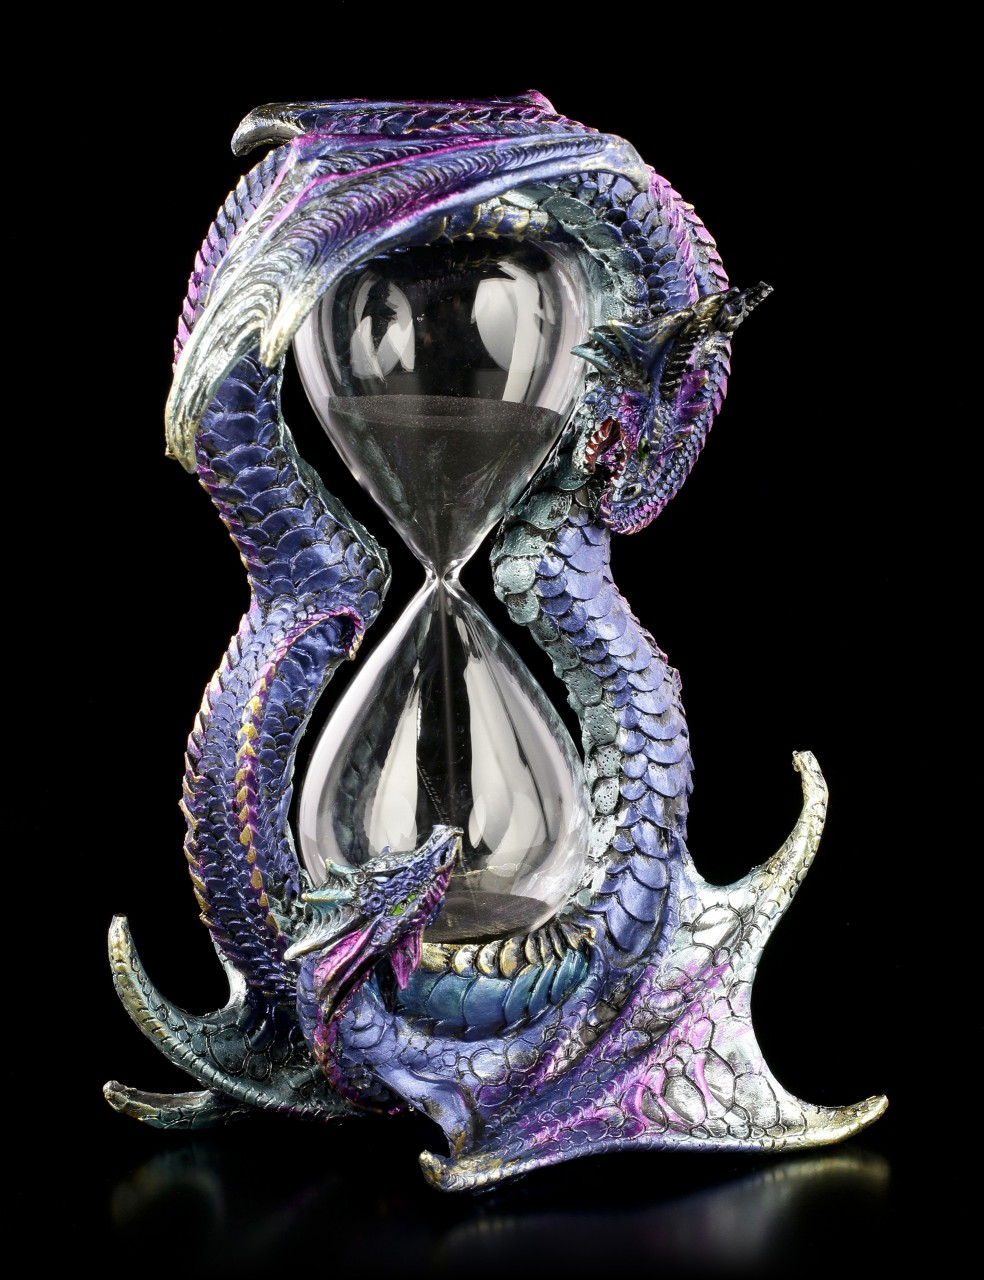 Drachen Sanduhr - Dragons Countdown